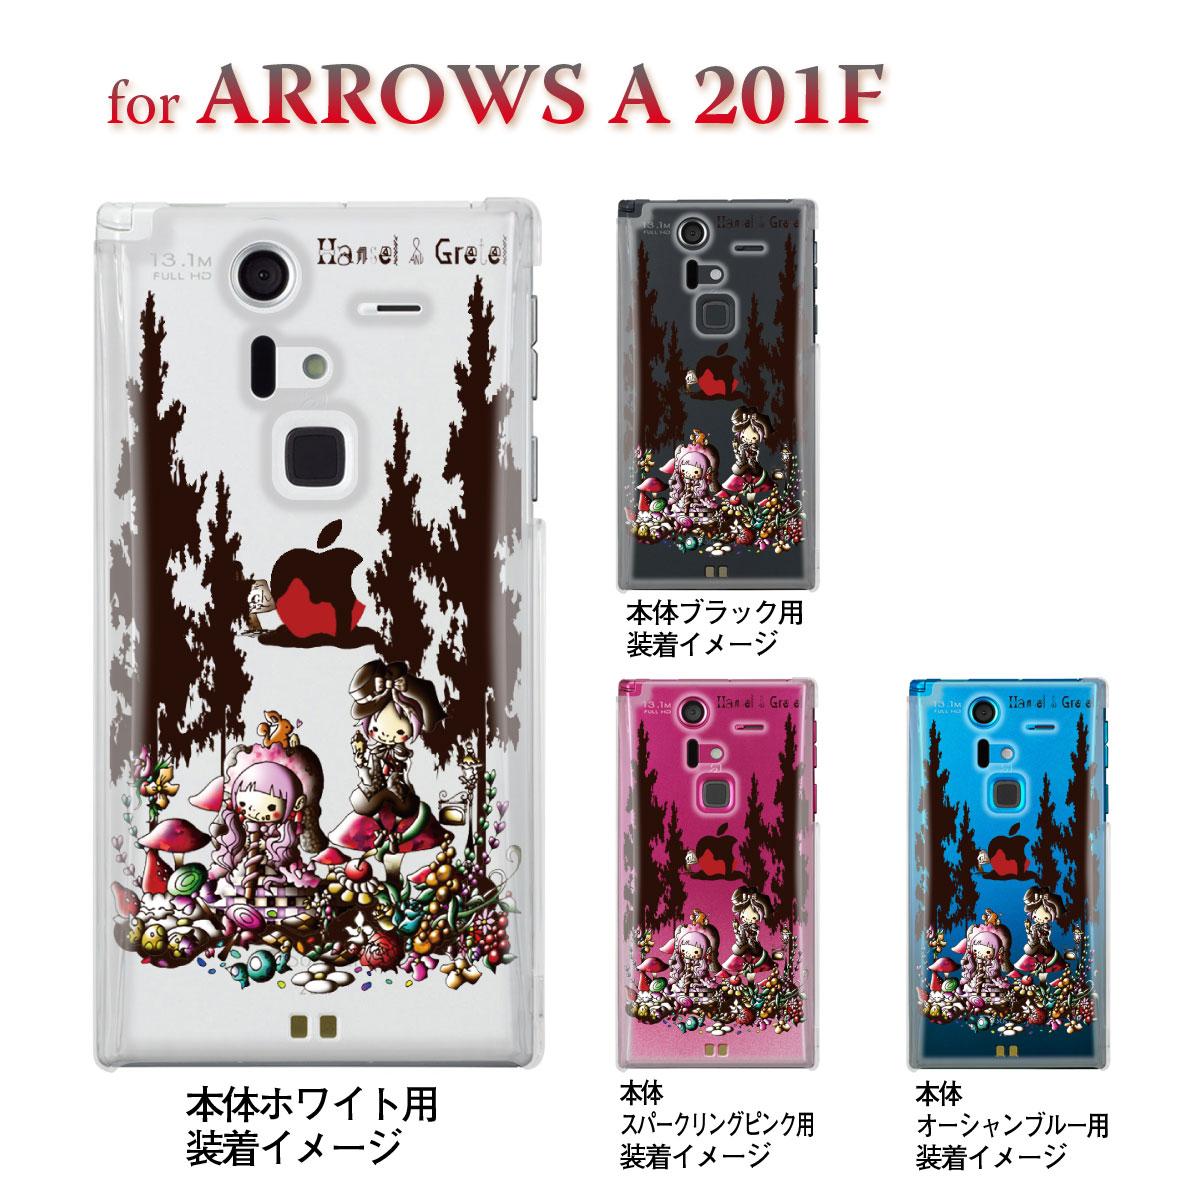 【Little World】【ARROWS A 201F】【201F】【Soft Bank】【カバー】【スマホケース】【クリアケース】【アート】【ベンゼルとグレーテル】【グリム童話】【お菓子の家】 25-201f-am0026